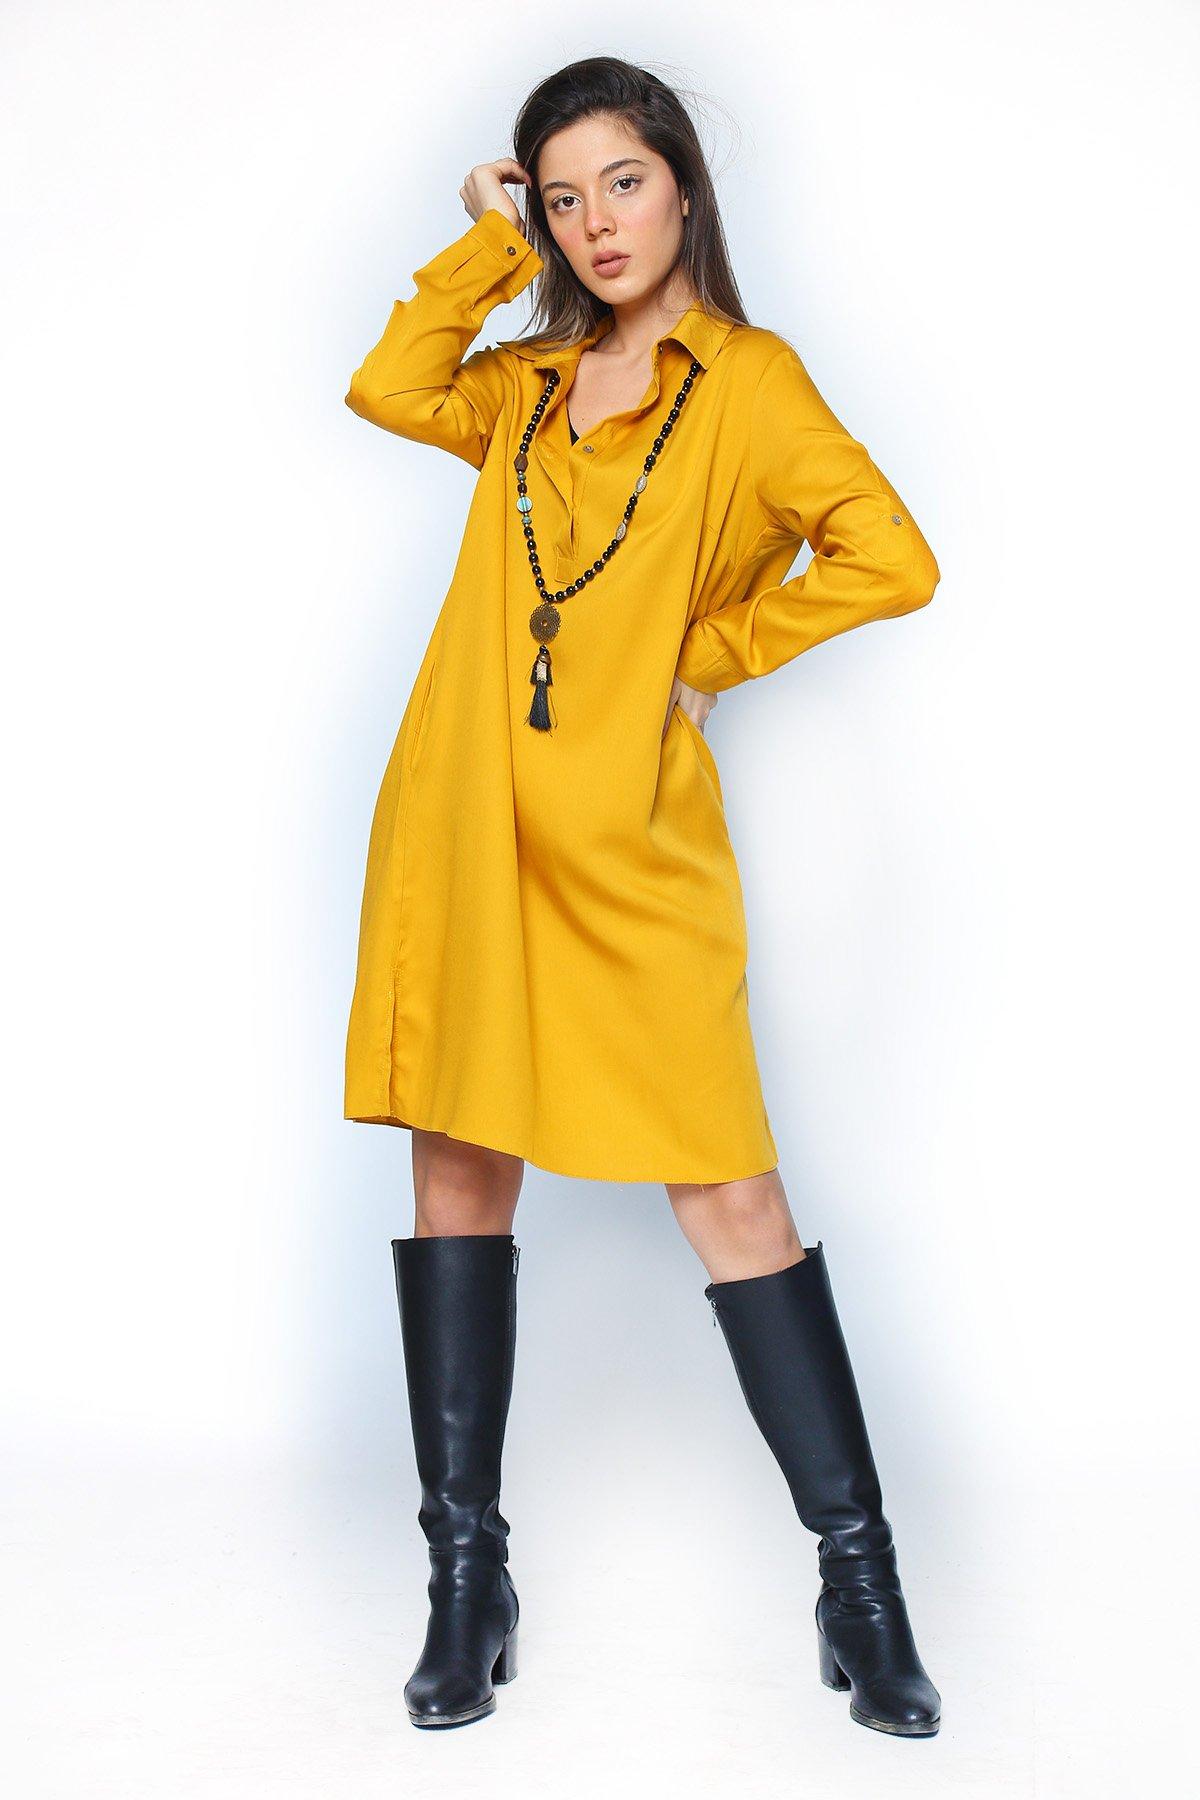 Kol Apoletli Gömlek Elbise